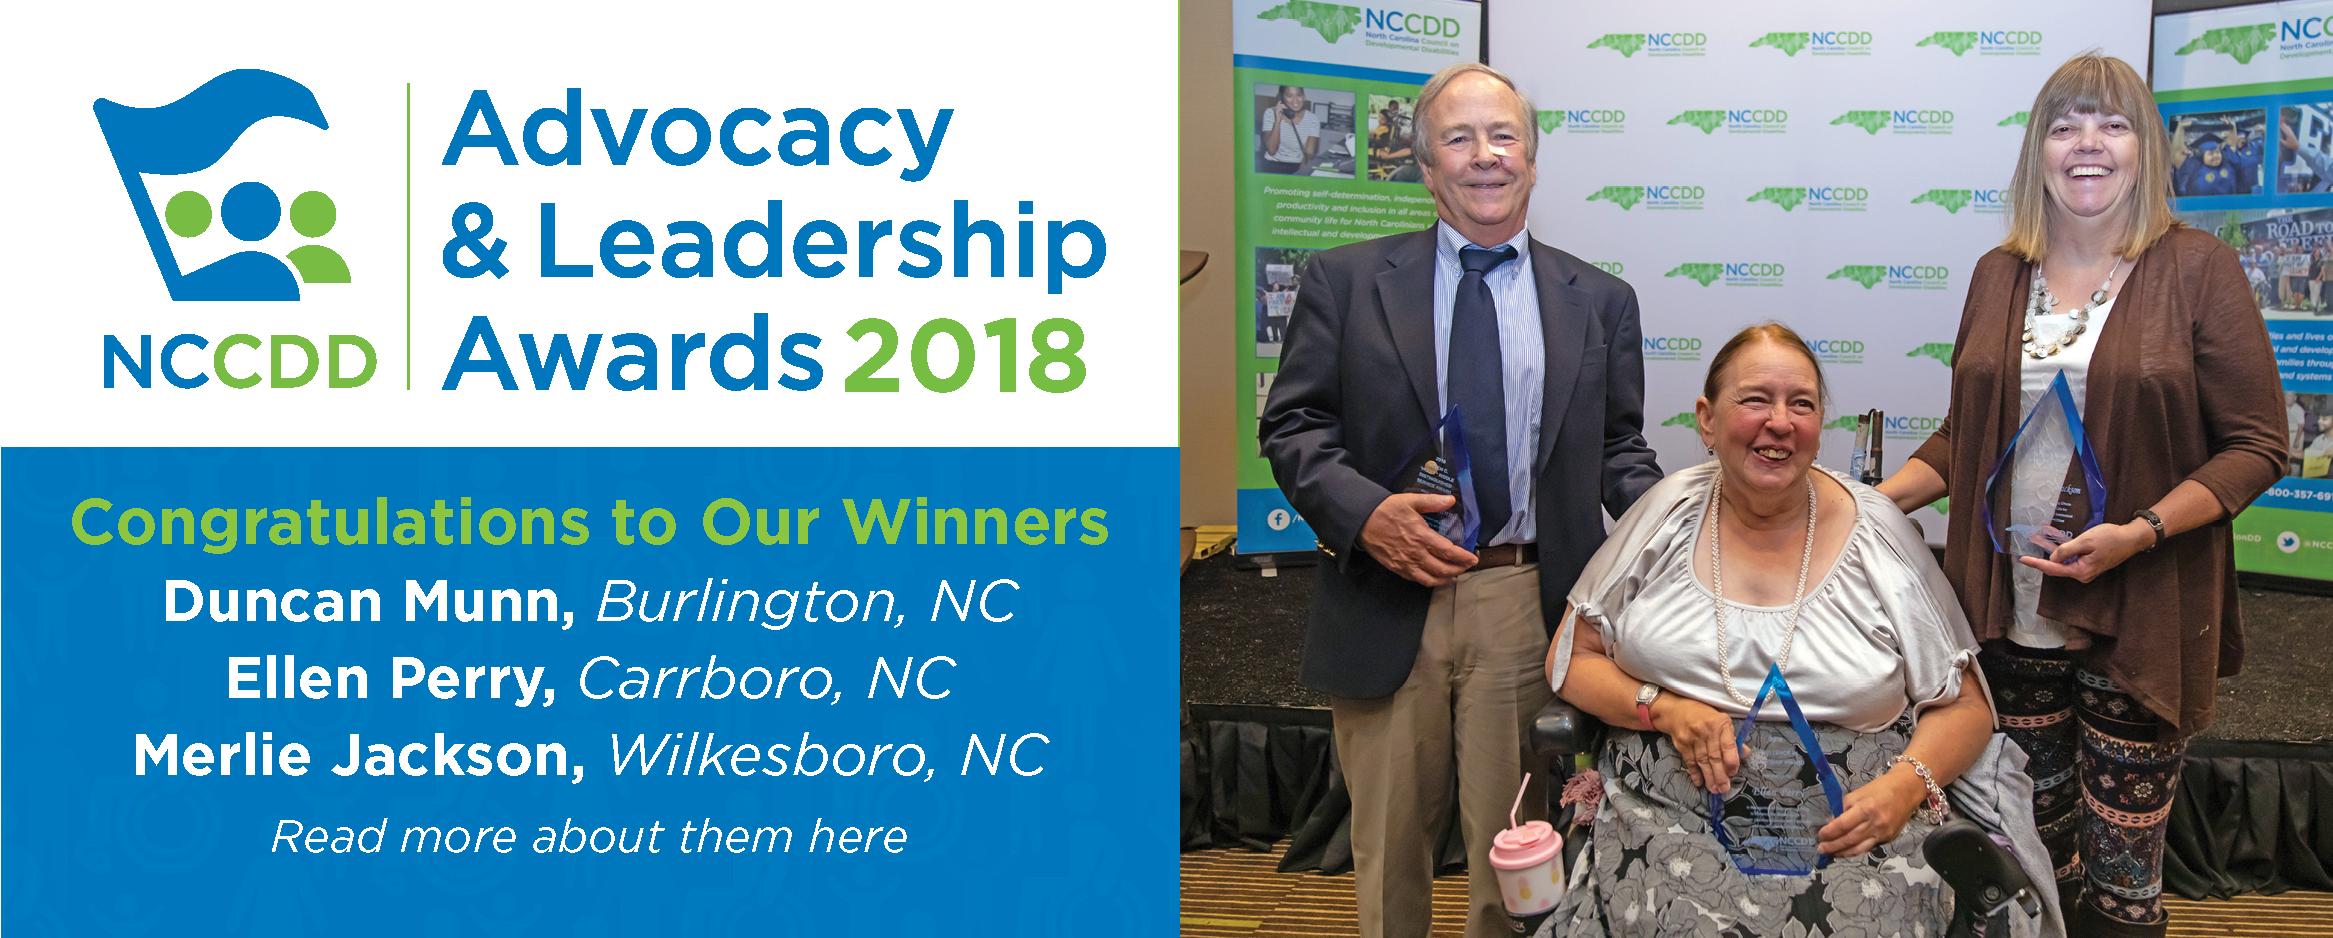 Congratulations to our 2018 Advocacy & Leadership Award Winners - Duncan Munn, Burlington, NC, Ellen Perry, Carrboro, NC, Merlie Jackson, Wilkesboro, NC